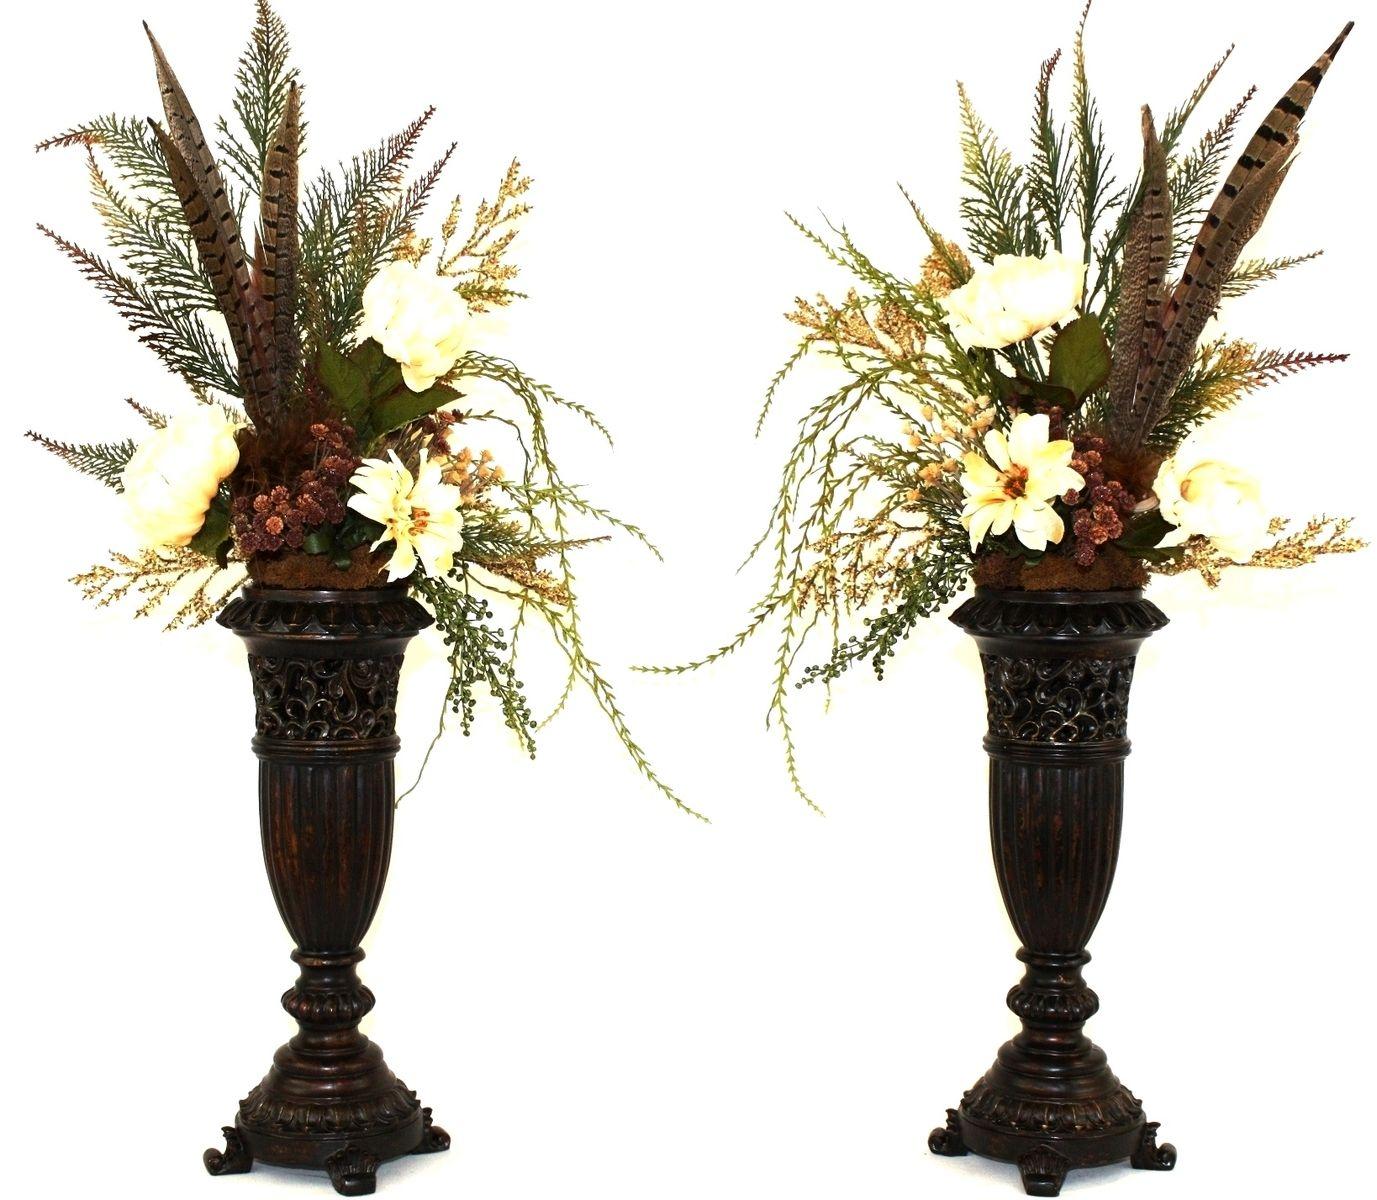 Hand Made Silk Flower Arrangement, Fireplace Mantel Decor ... on Decorative Wall Sconces For Flowers Arrangements id=34843